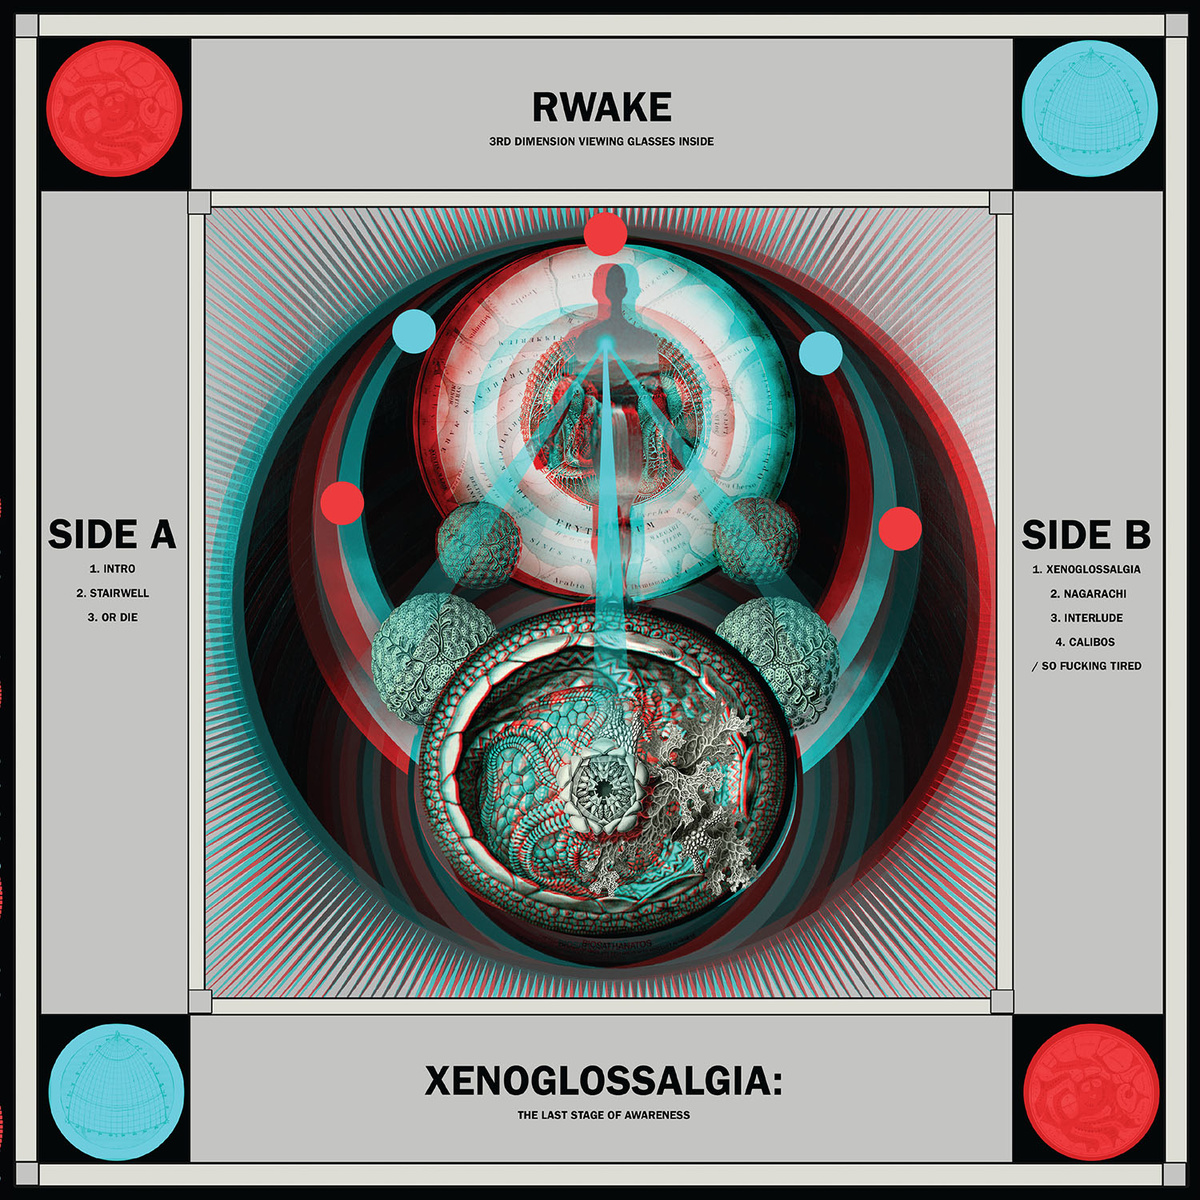 Rwake XENOGLOSSALGIA- THE LAST STAGE OF AWARENESS (Wiederveröffentlichung